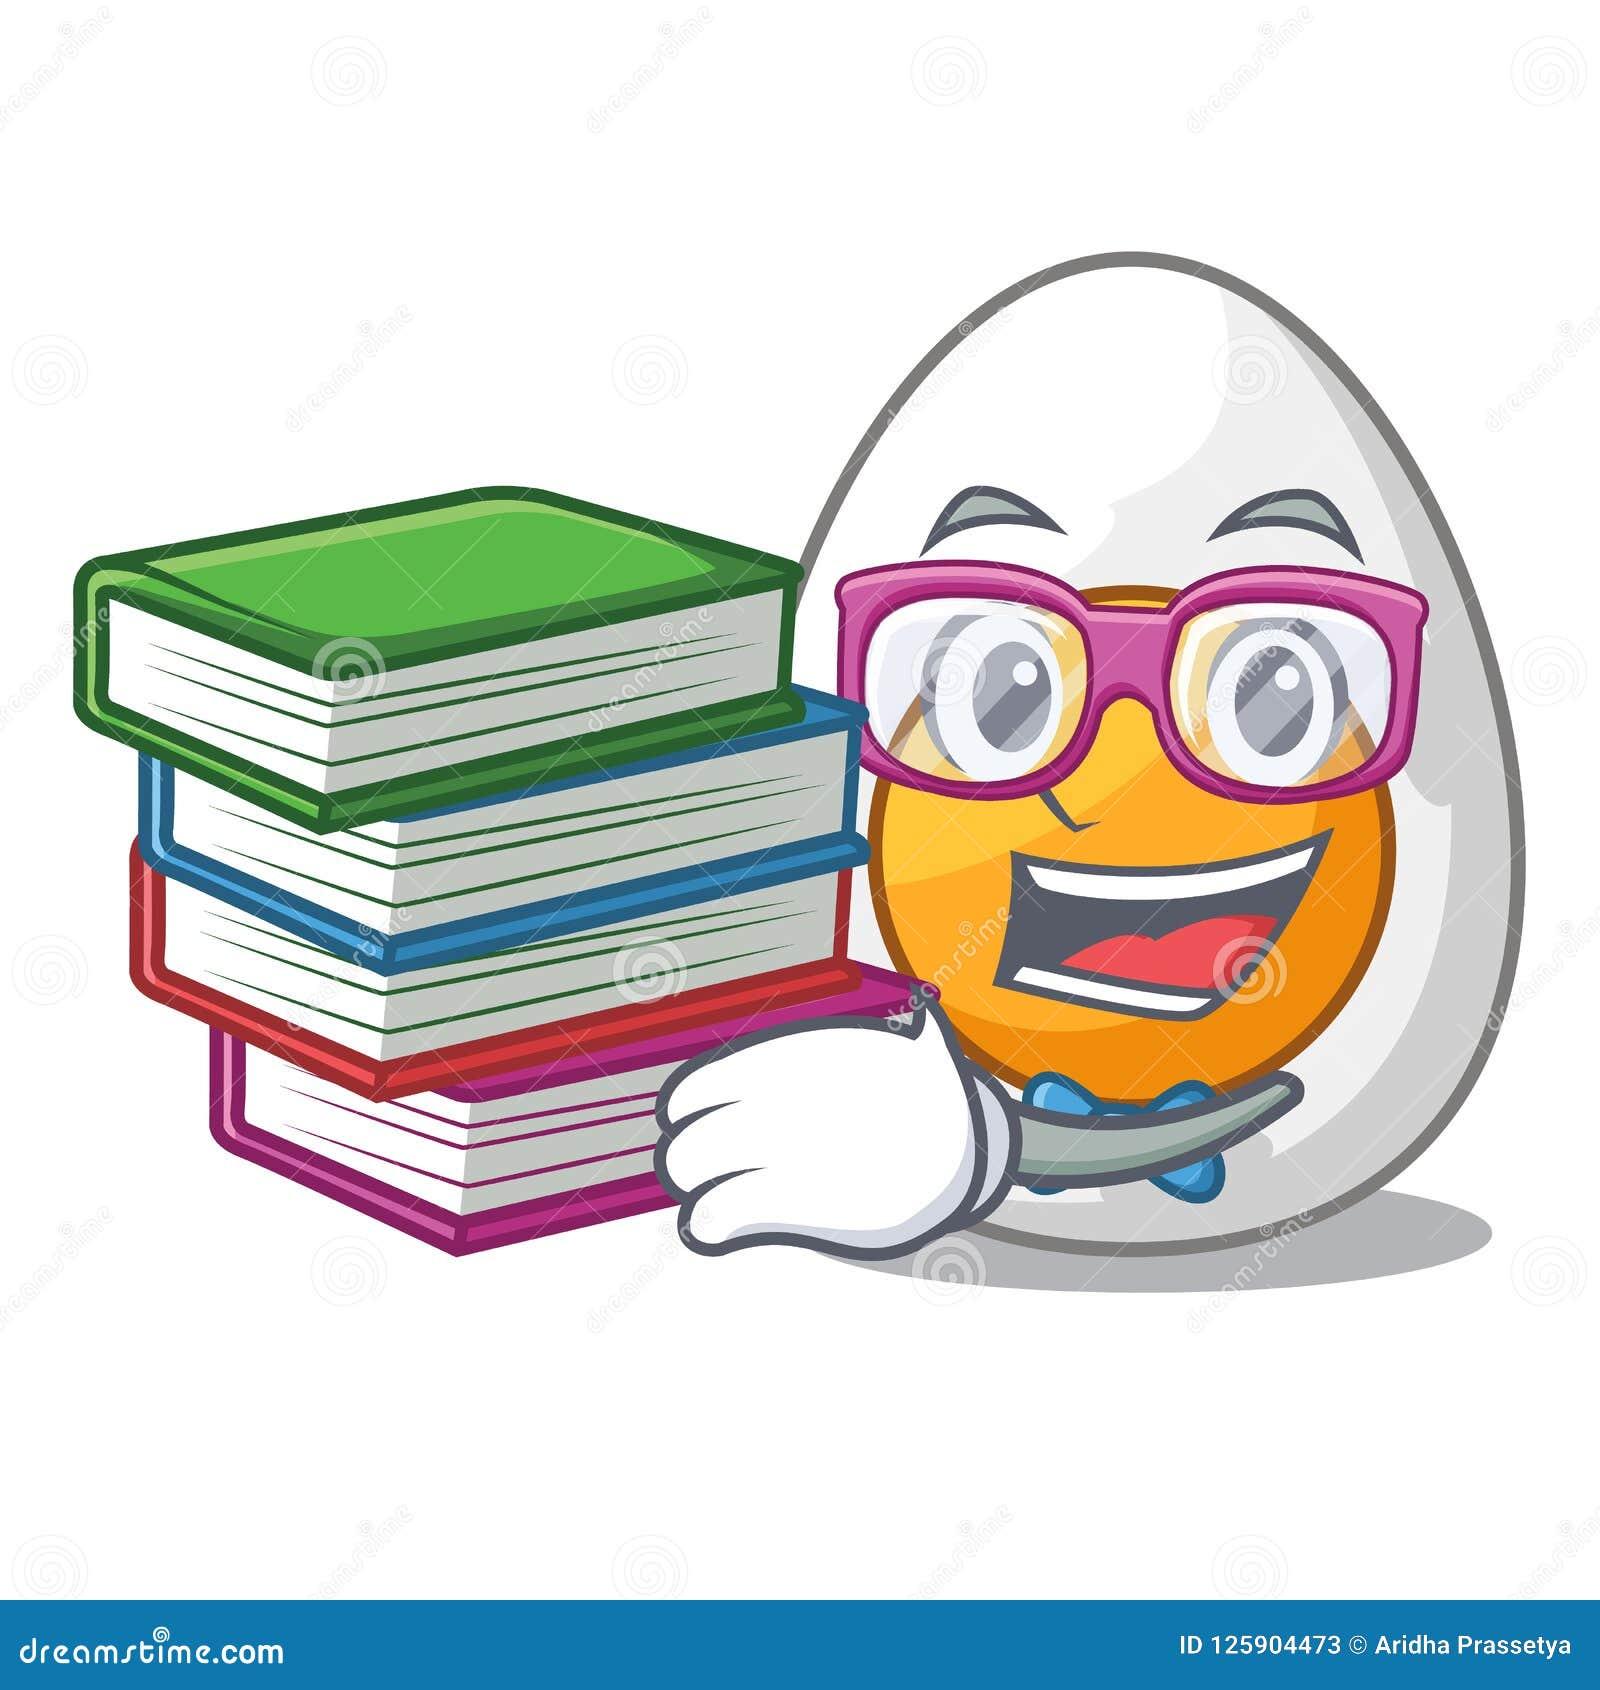 Студент при книги вареное яйцо свеже изолированное на шарже талисмана